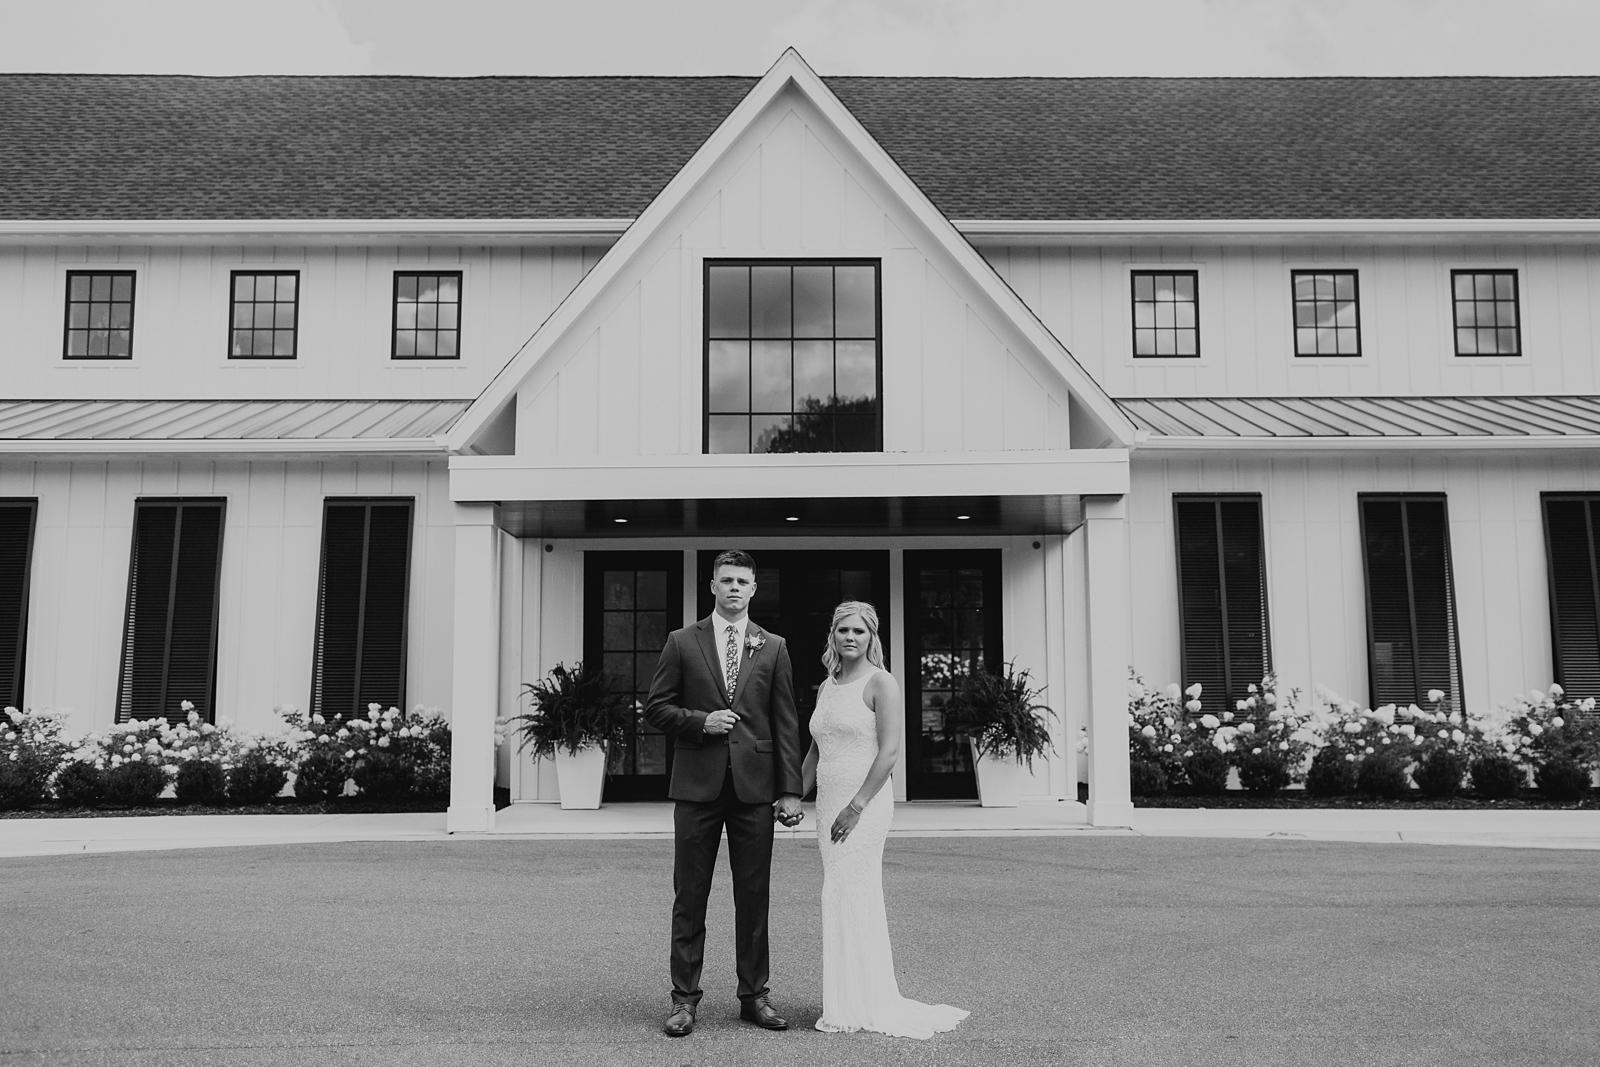 Anna & Trey Modern Minneapolis Wedding at The Hutton House_0703.jpg